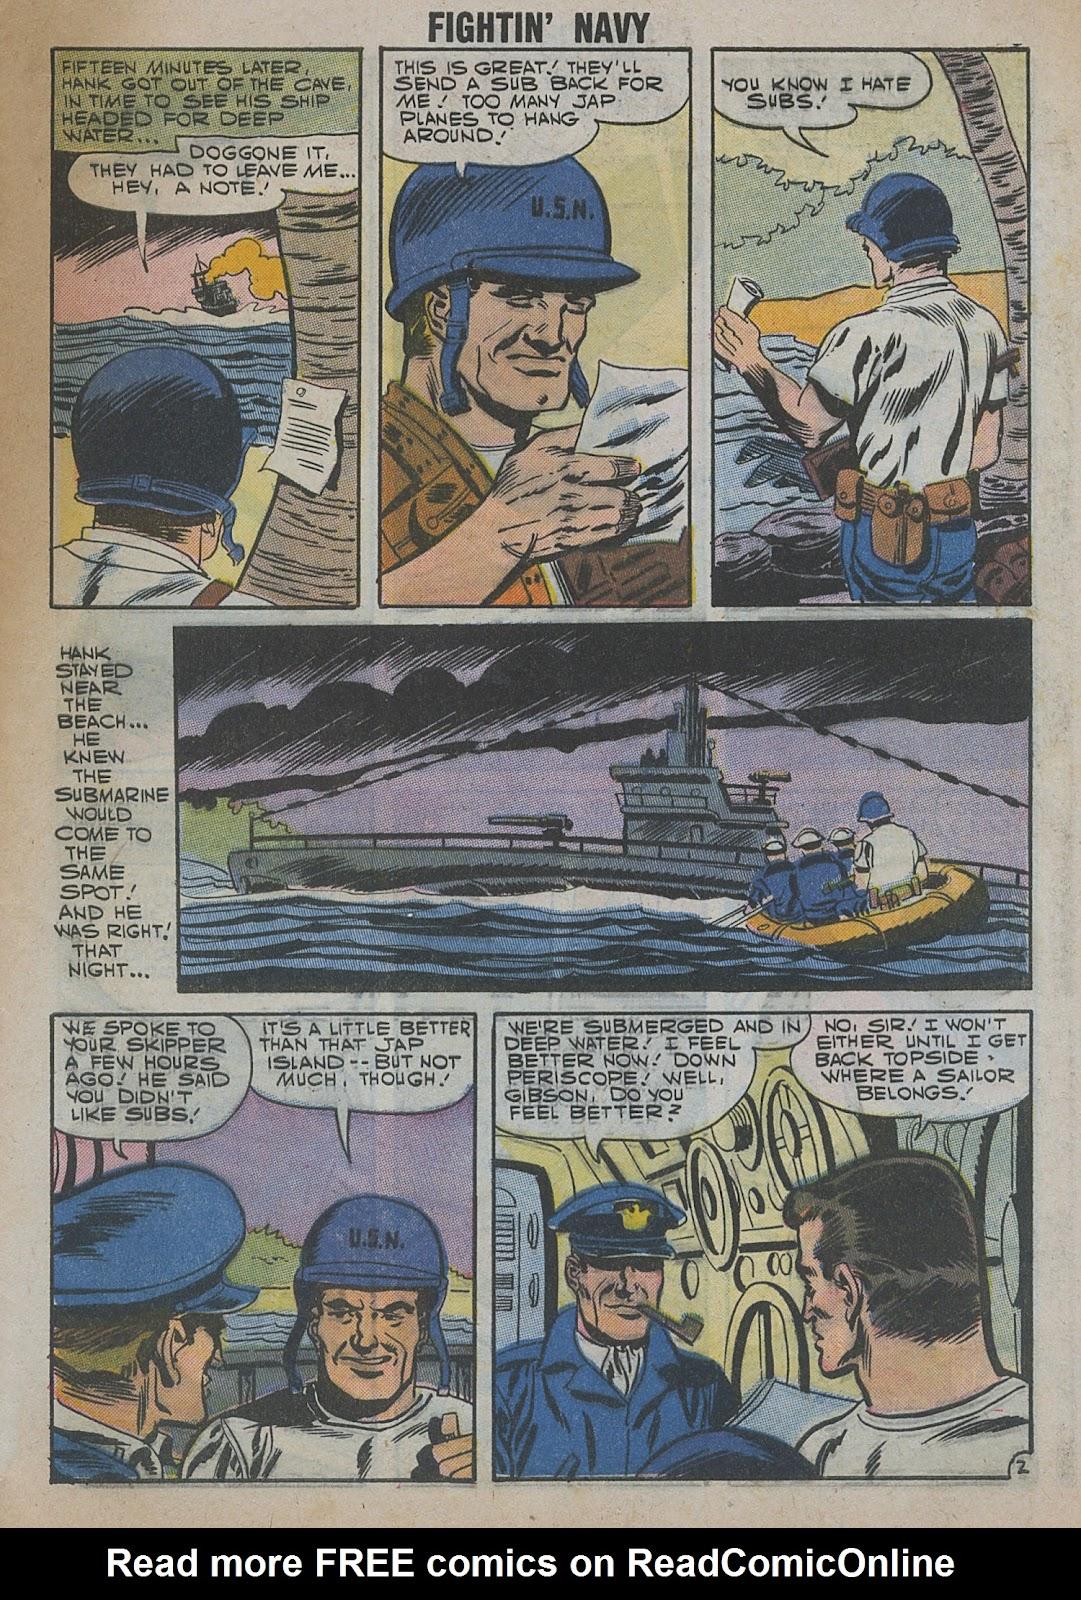 Read online Fightin' Navy comic -  Issue #82 - 55